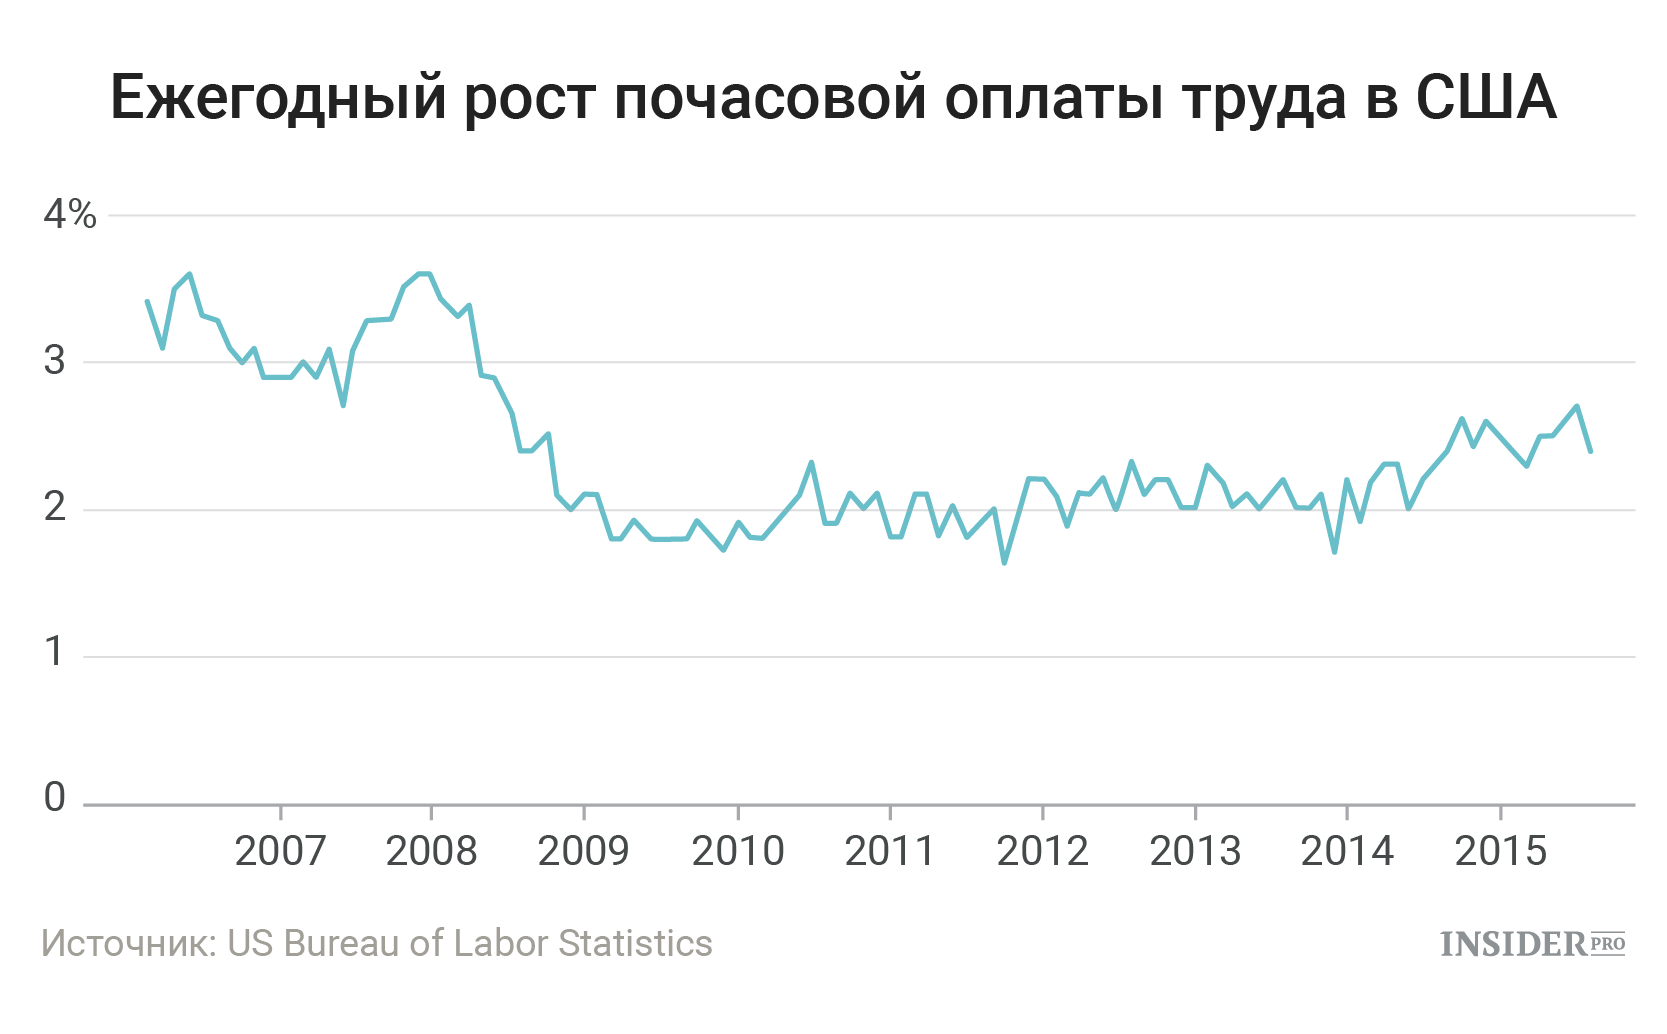 Оплата труда в США